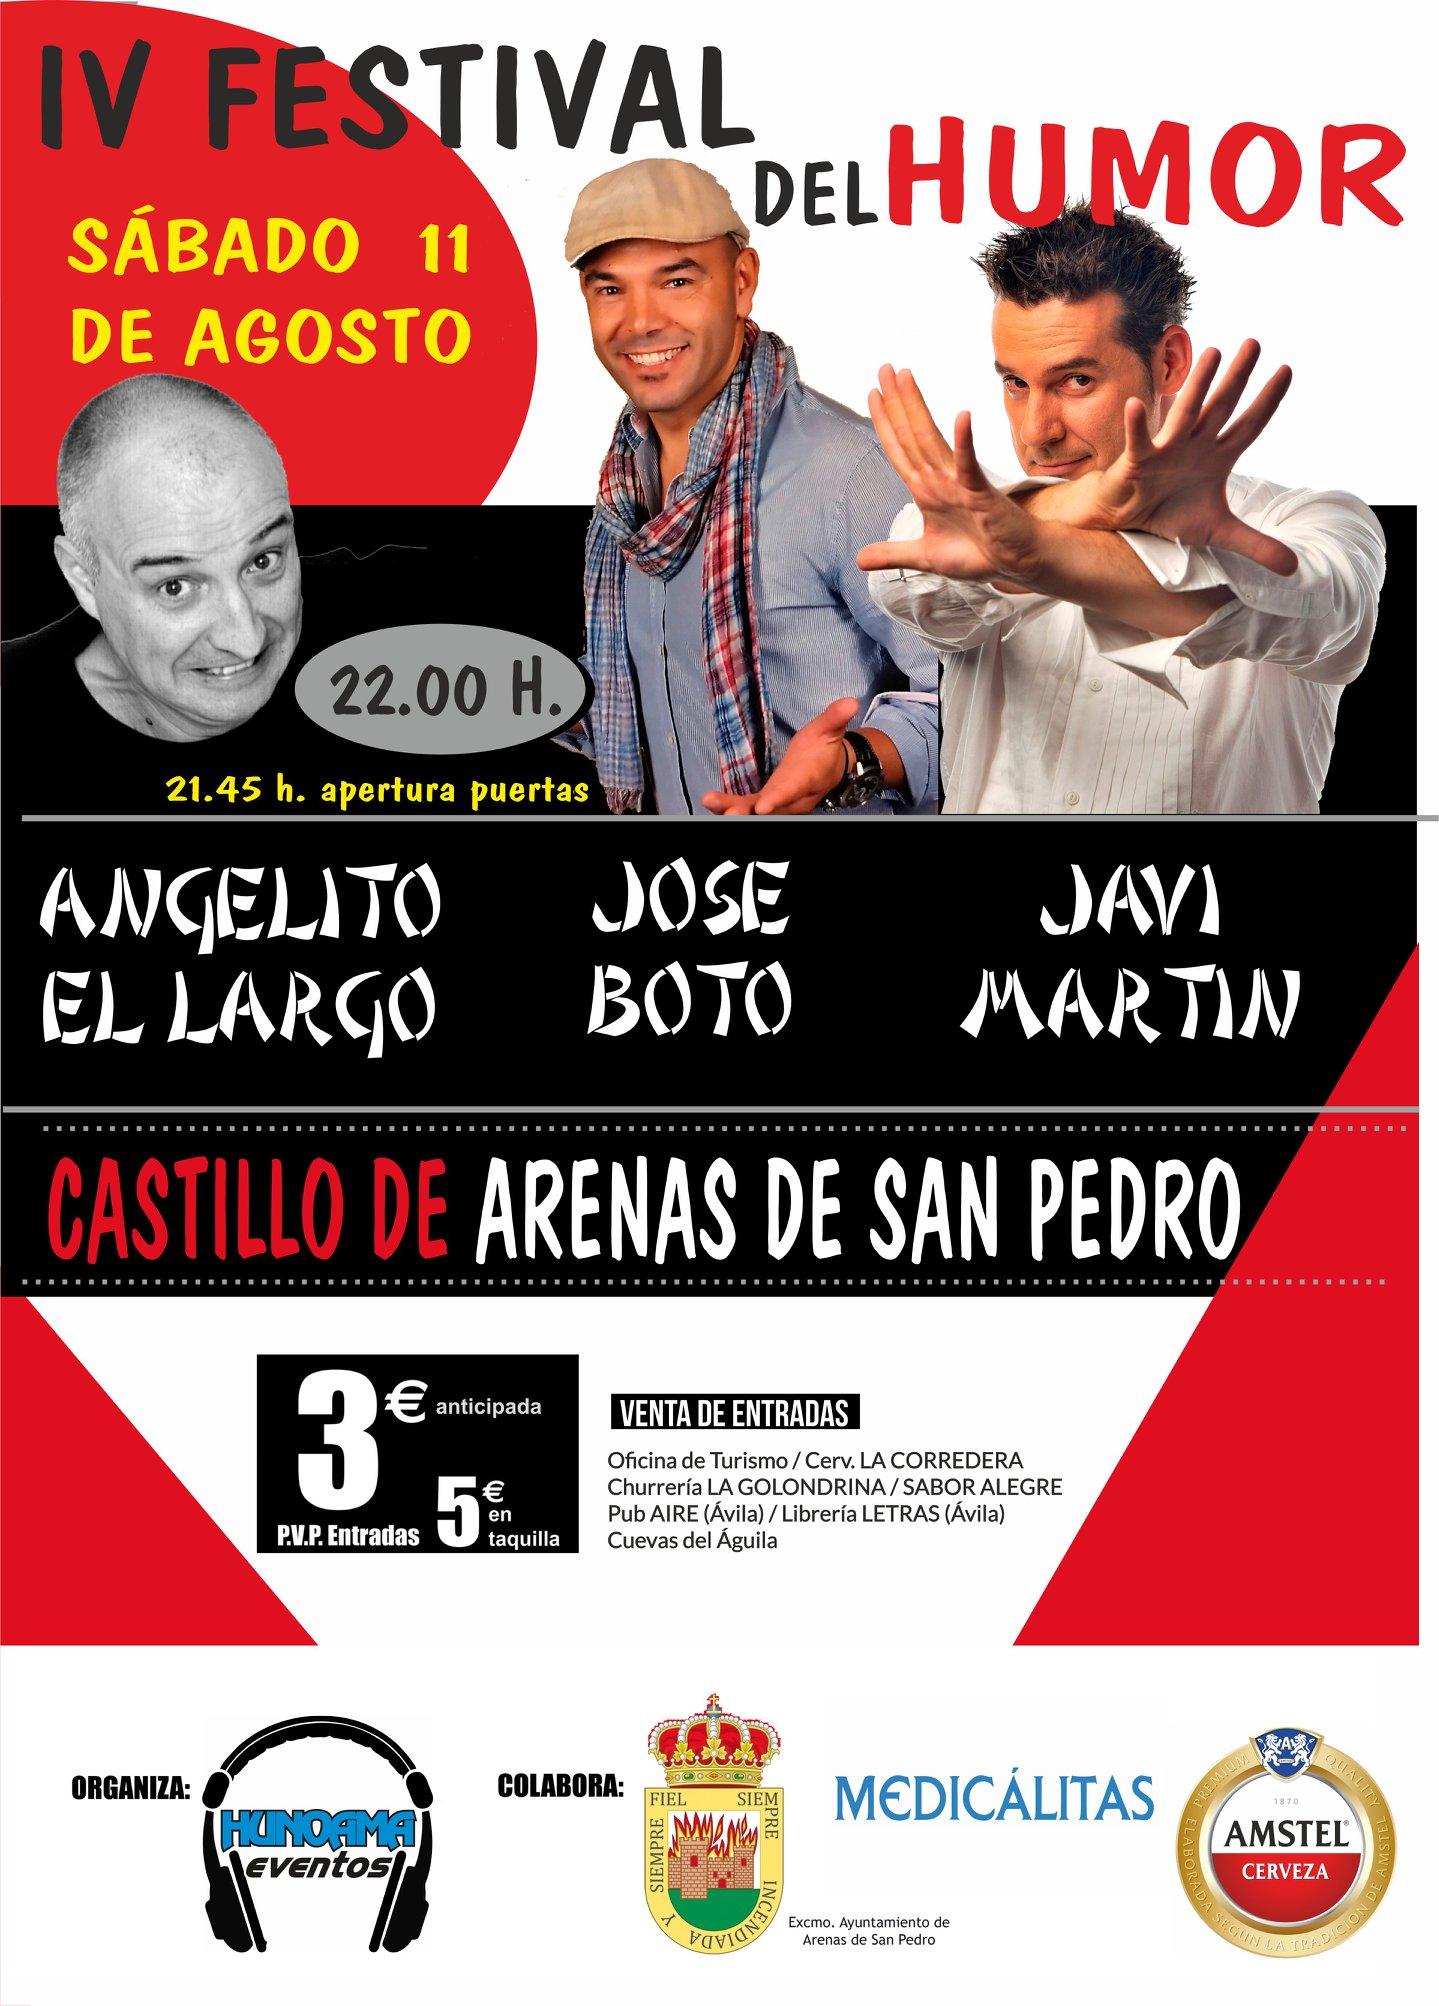 Noche de Humor - Arenas de San Pedro - TiétarTeVe